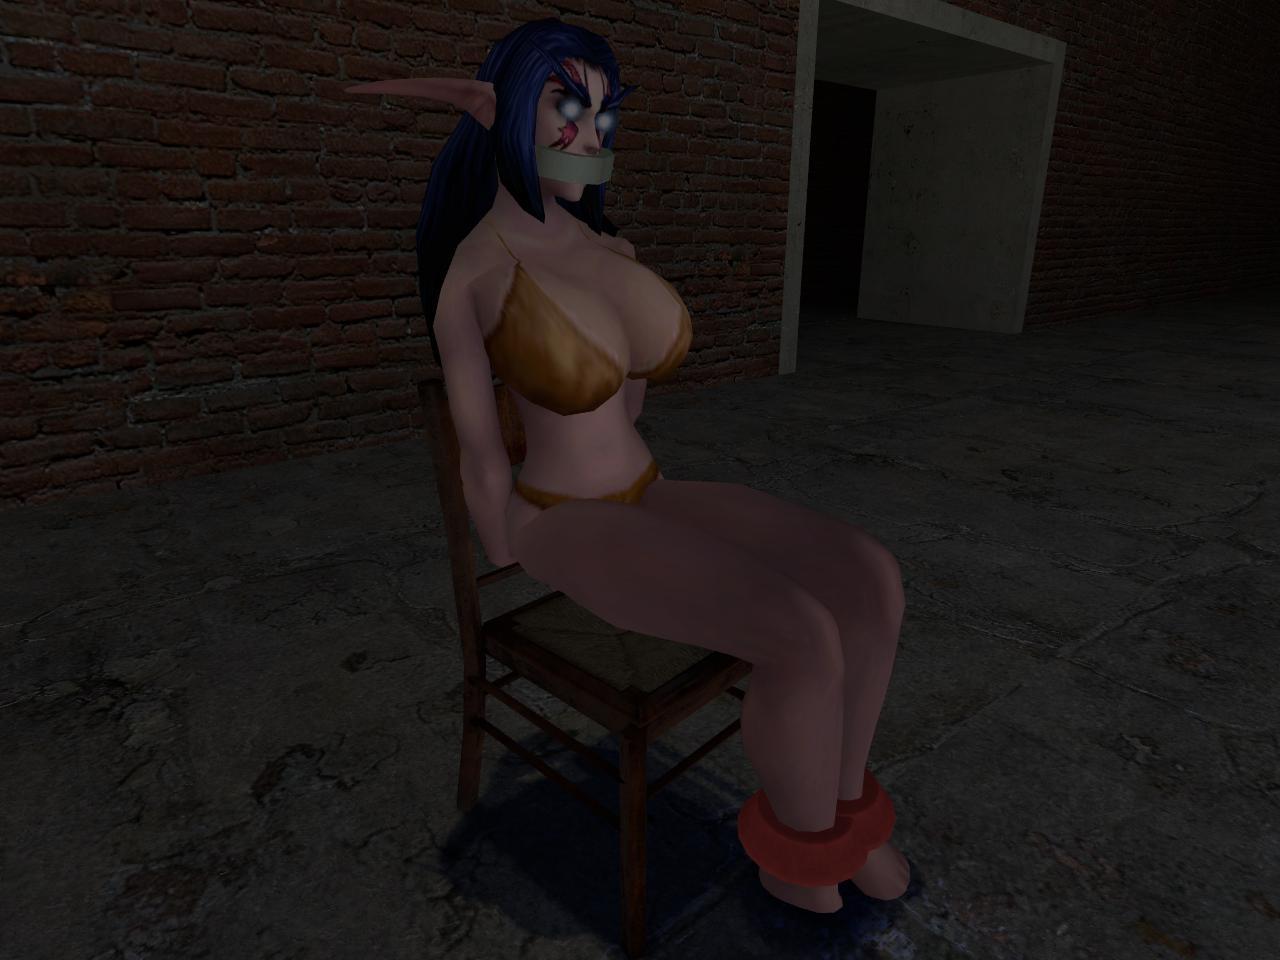 Troll and girl bondage sex image